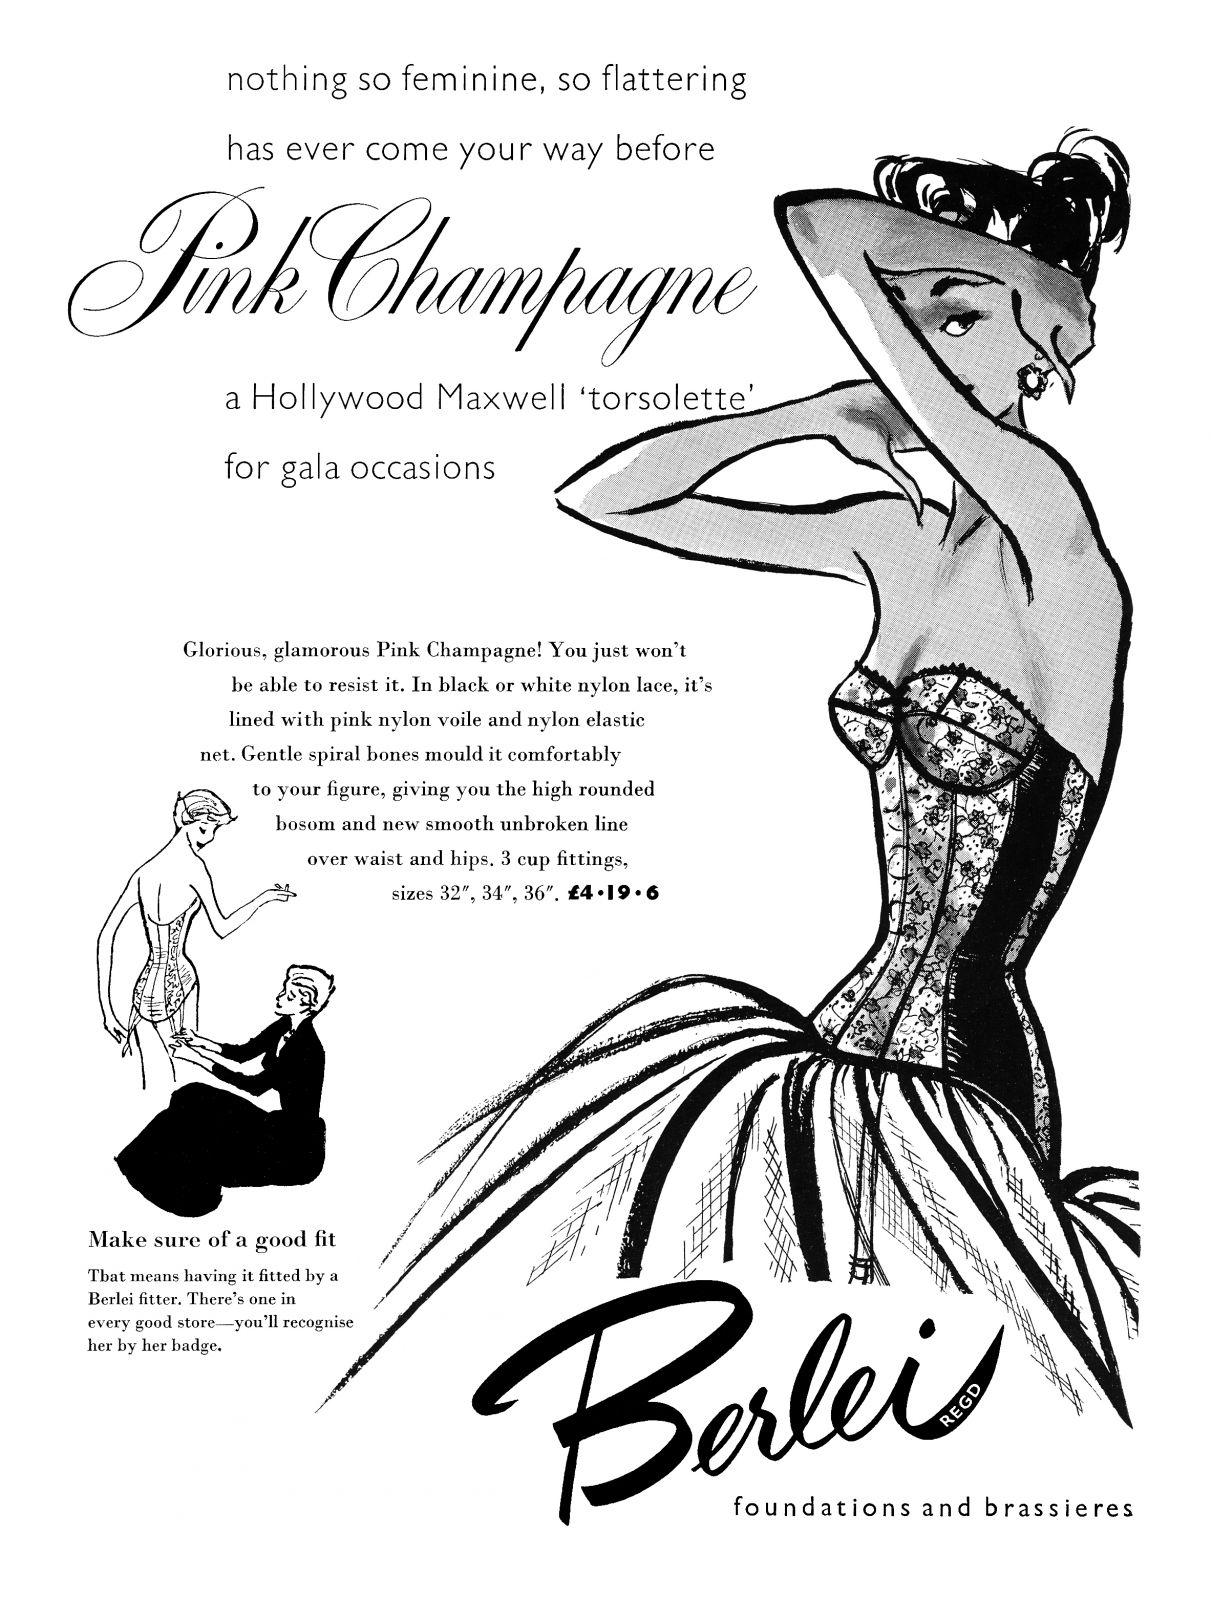 1955 Berlei Pink Champagne ad